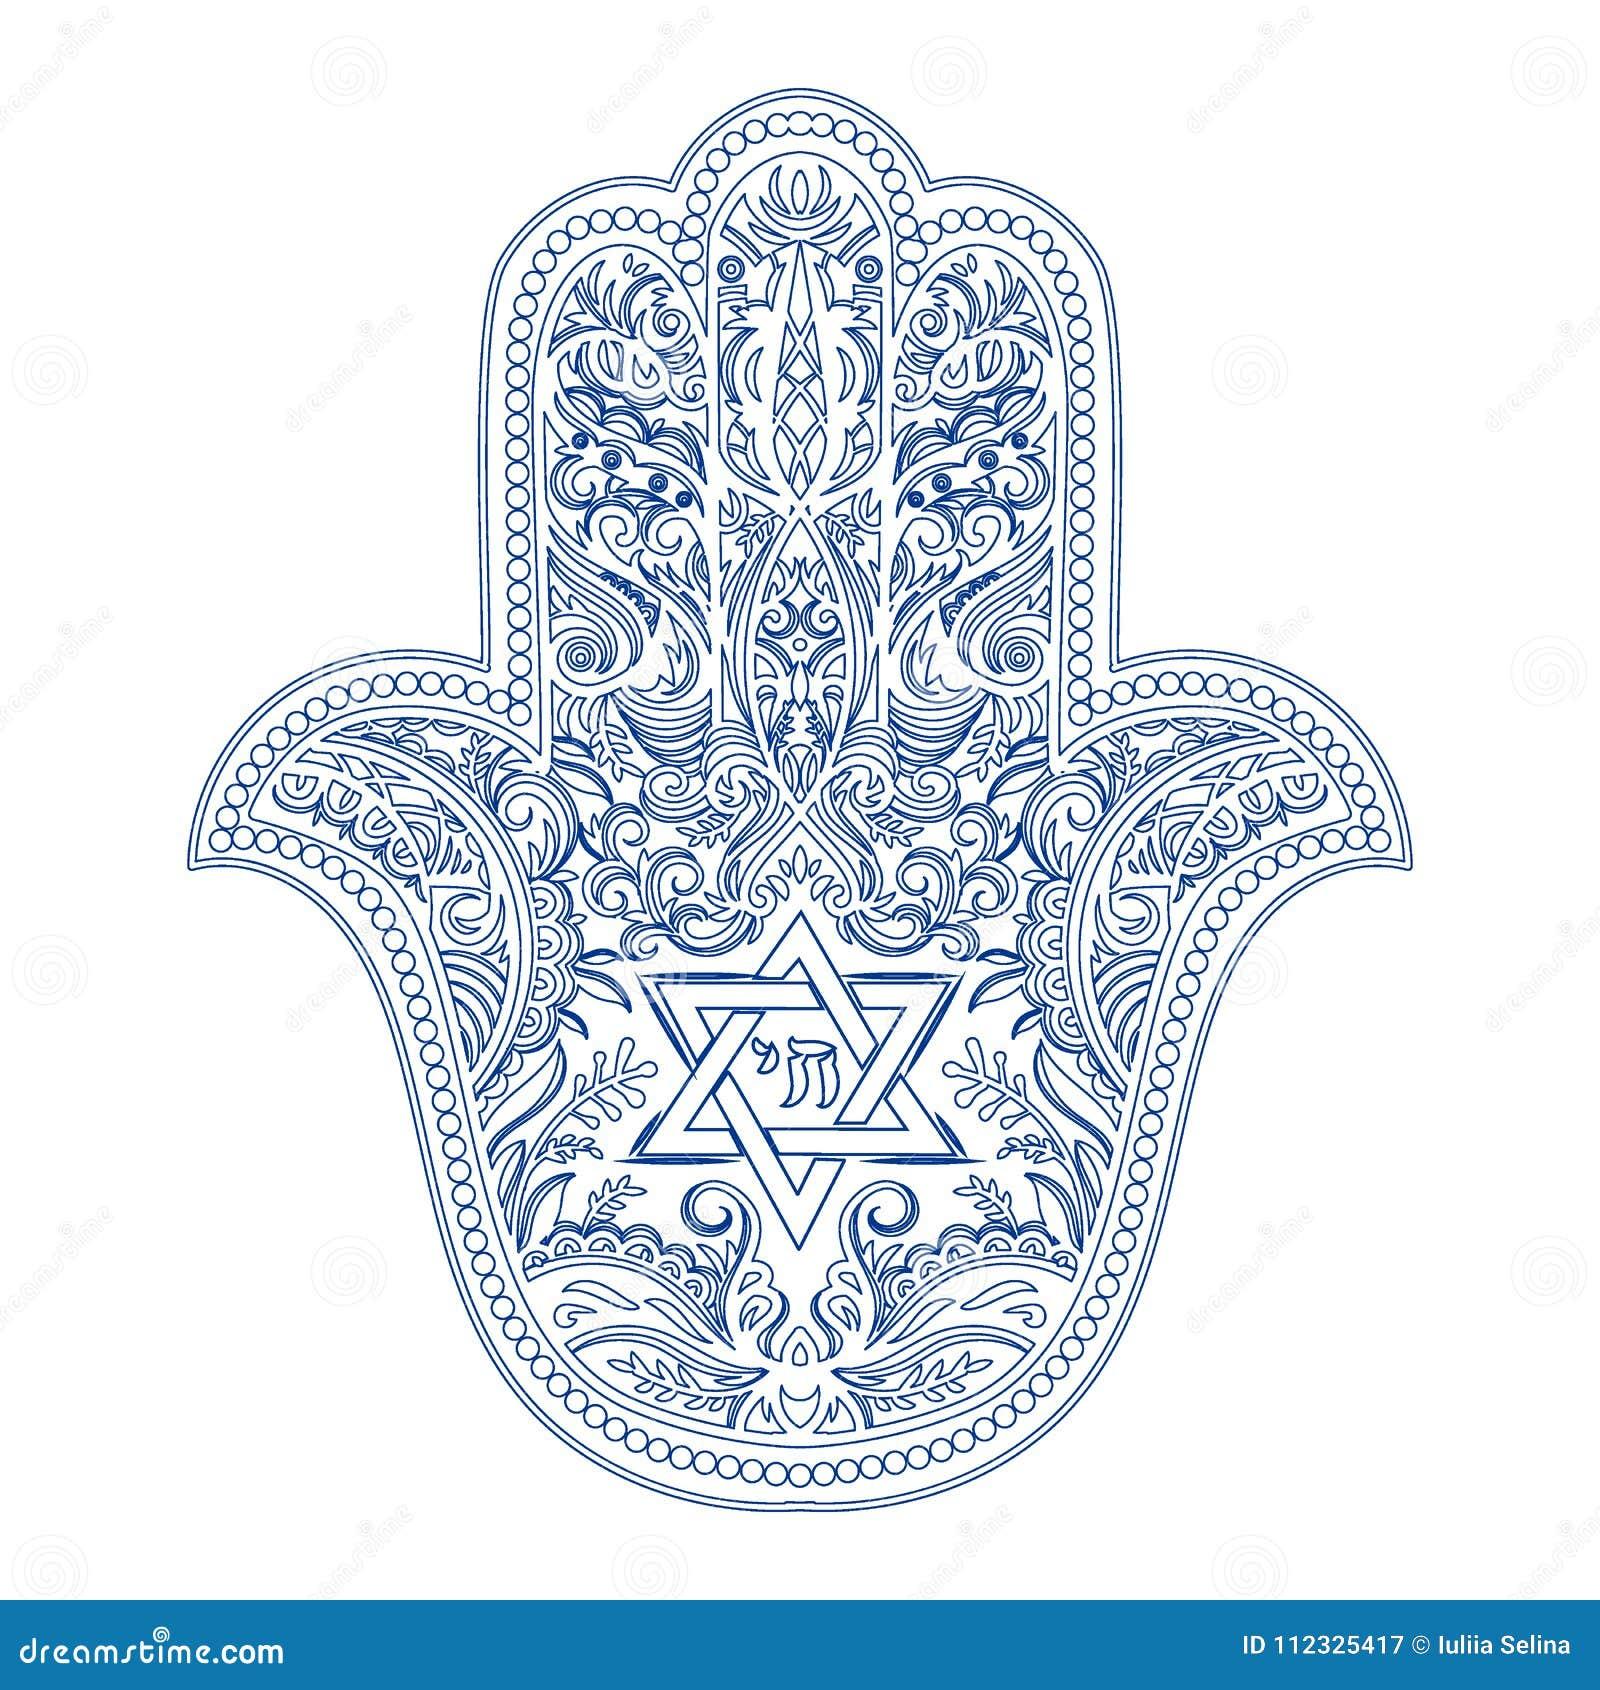 Jewish Hamsa Tattoo Stock Vector Illustration Of Quality 112325417